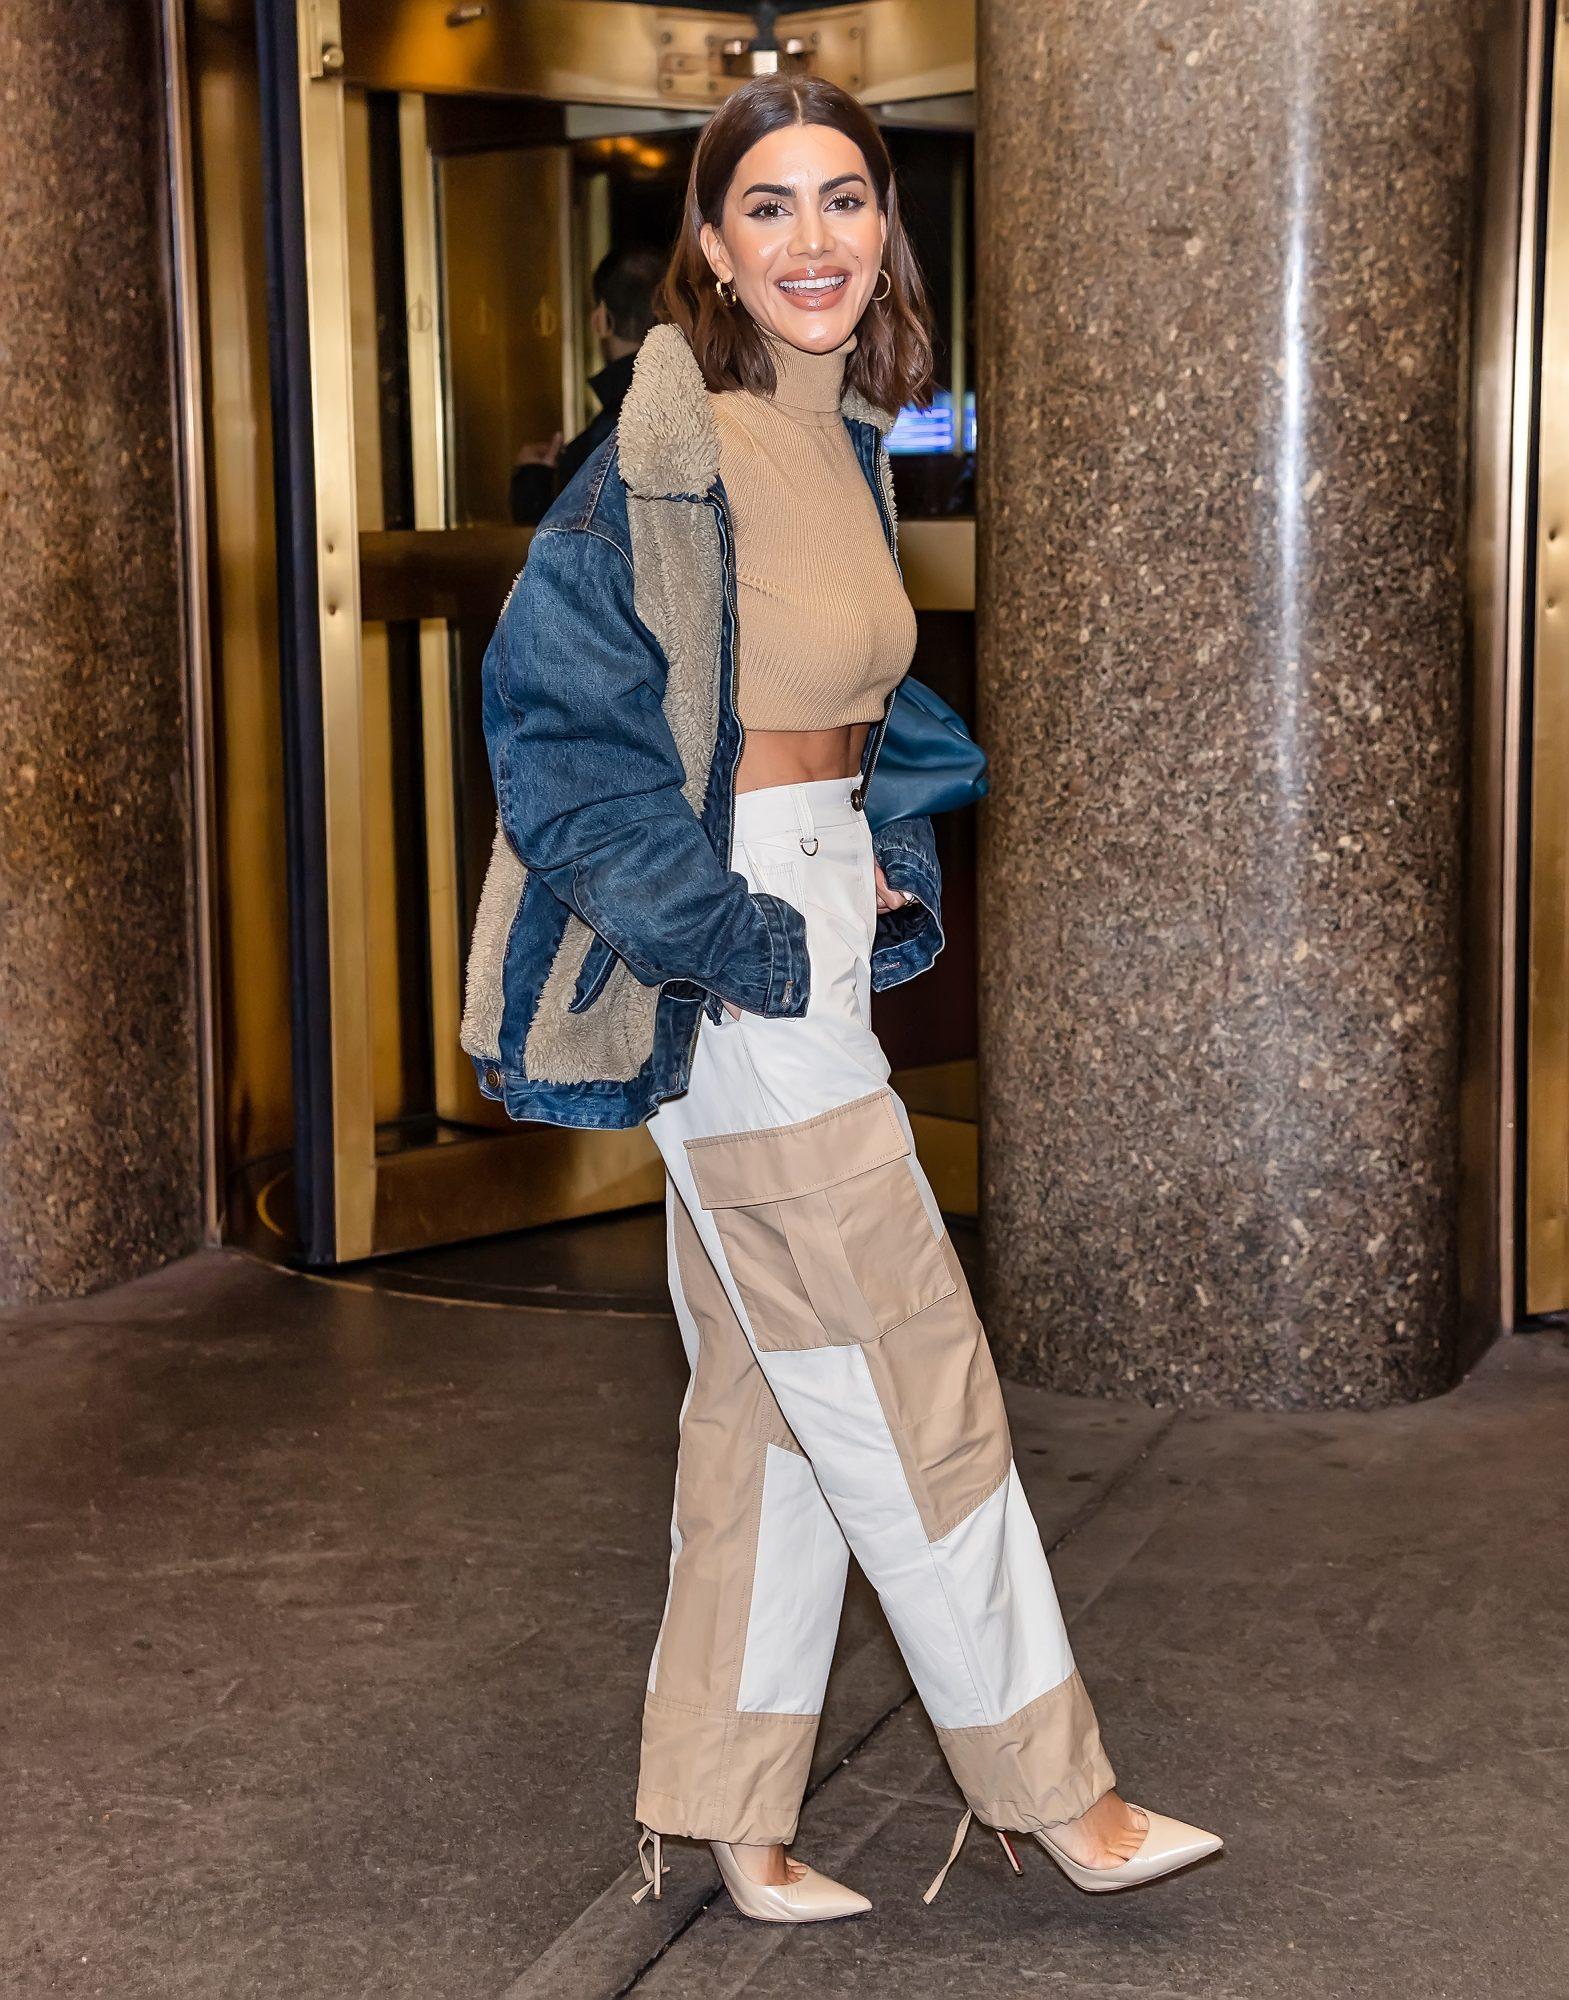 Celebrity Sightings In New York City - February 11, 2020